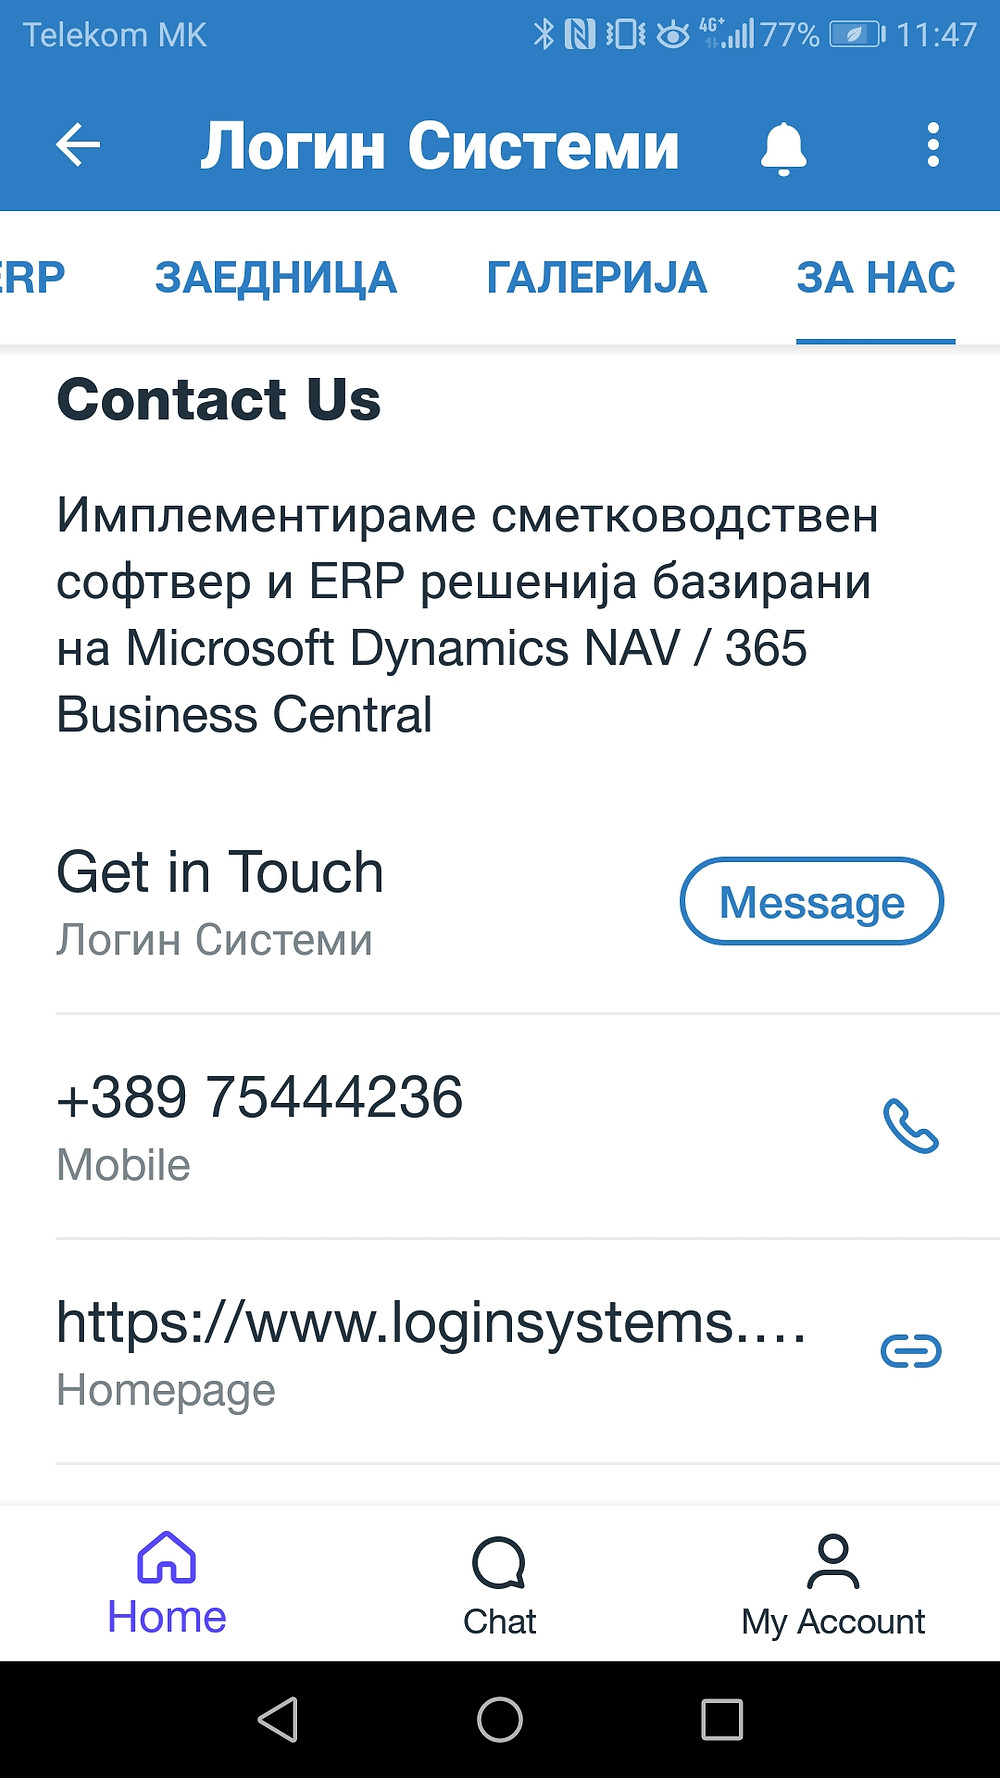 Контакти за директна комуникација